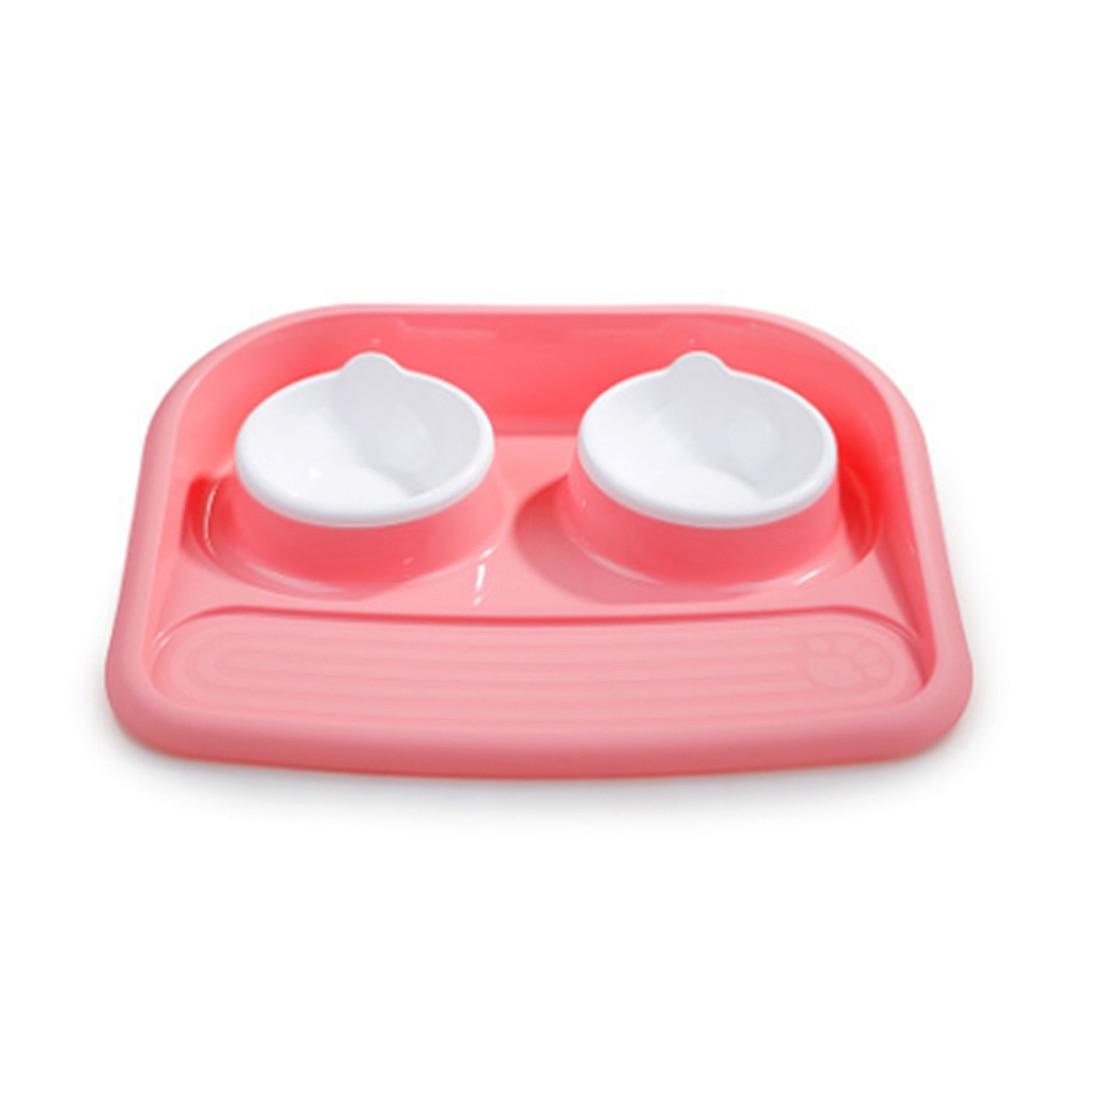 environmental protection food grade plastic bone type double bowl pet bowl splashproof dog bowl dog cat food bowl